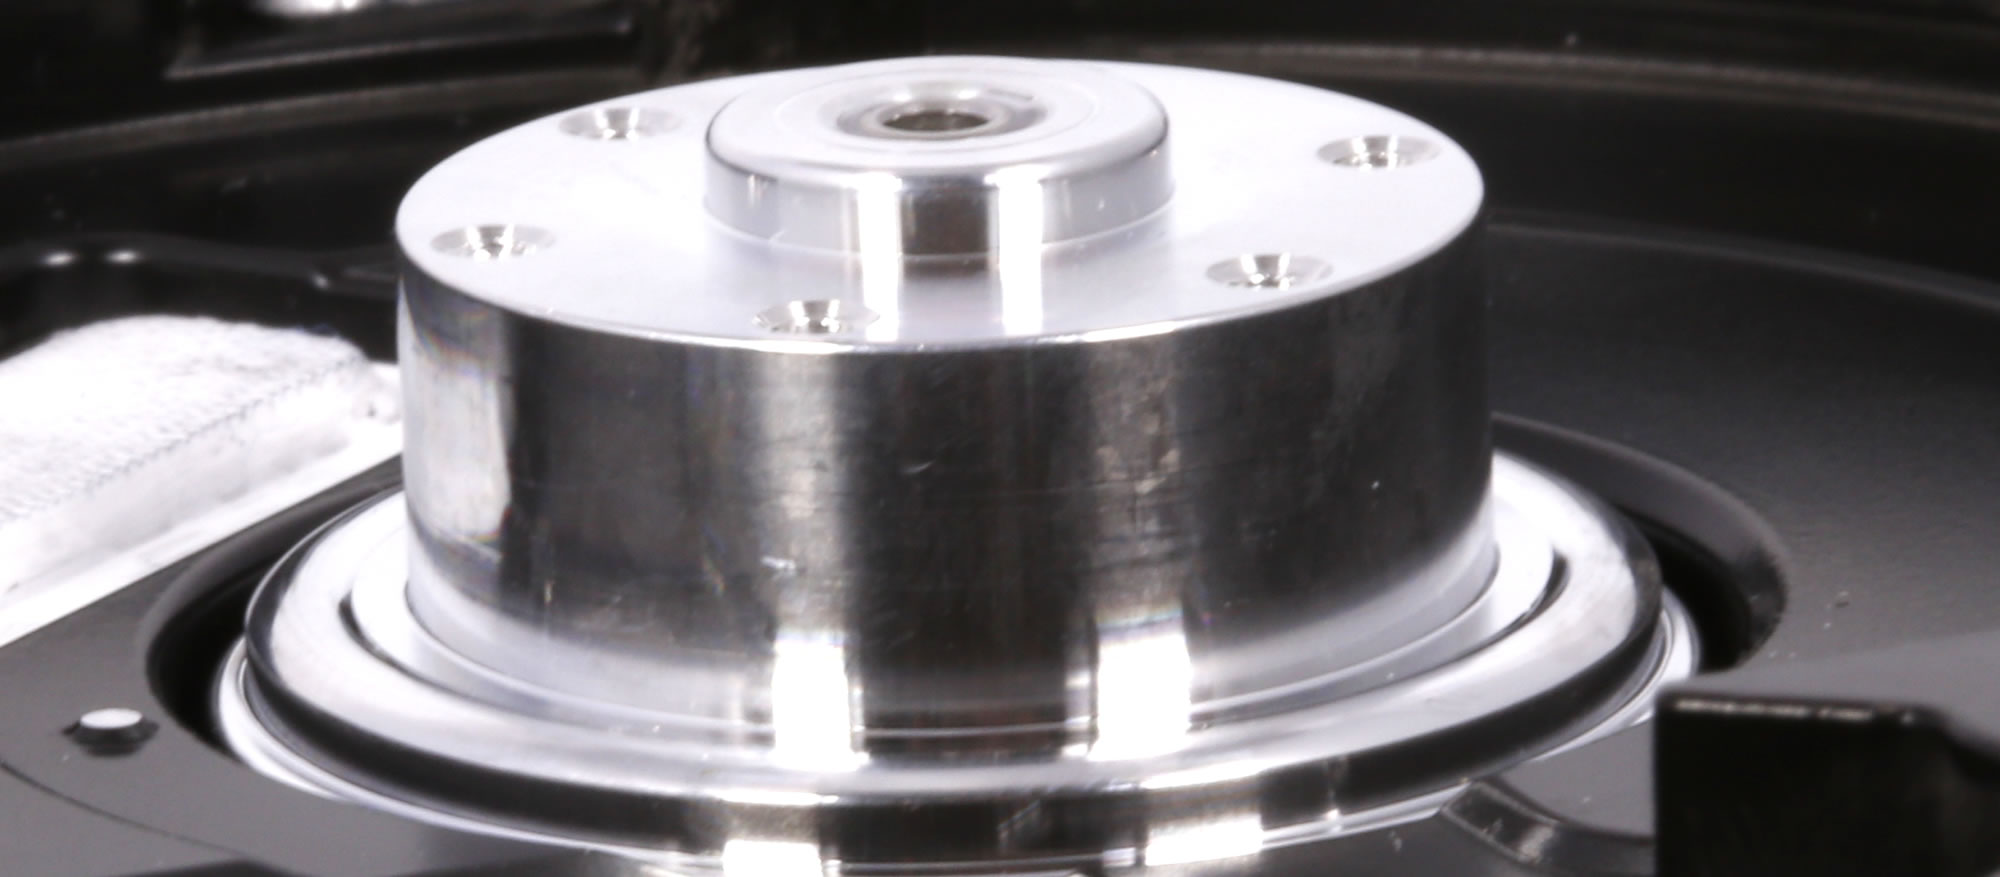 festplatten-datenrettung-festplattenmotor-reparatur-bindig-media